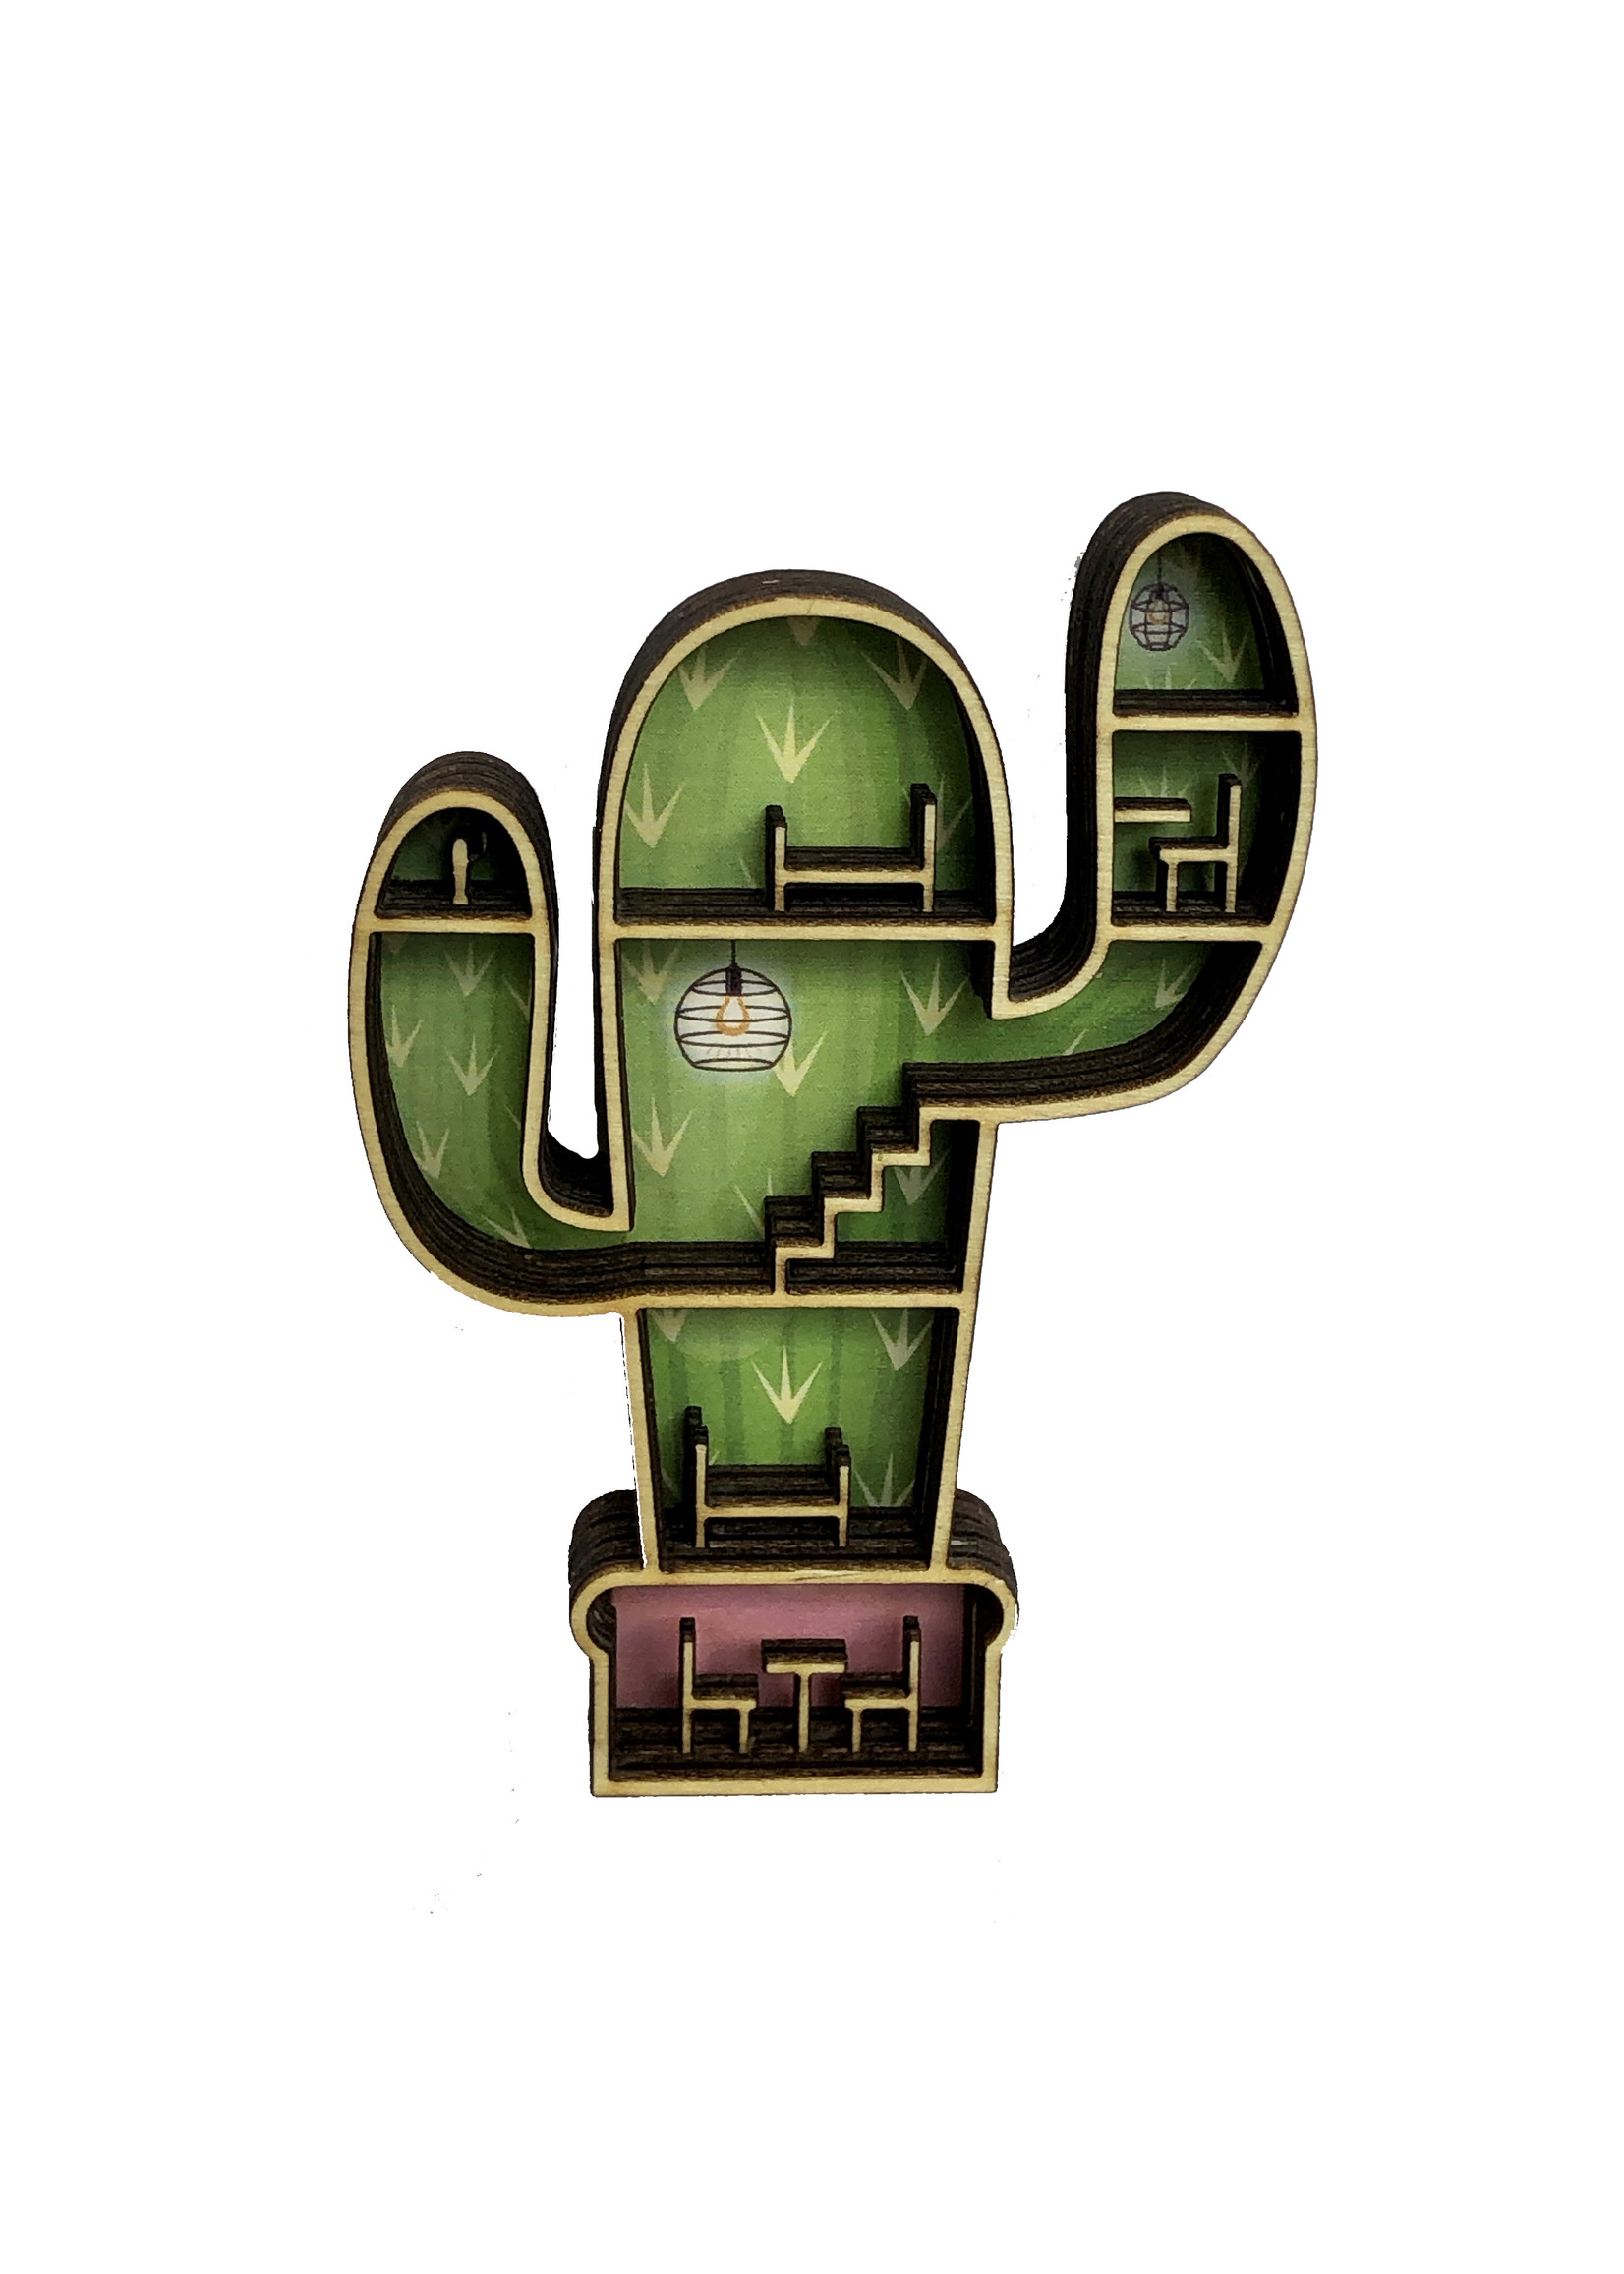 Mini poppenhuisje in cactus vorm